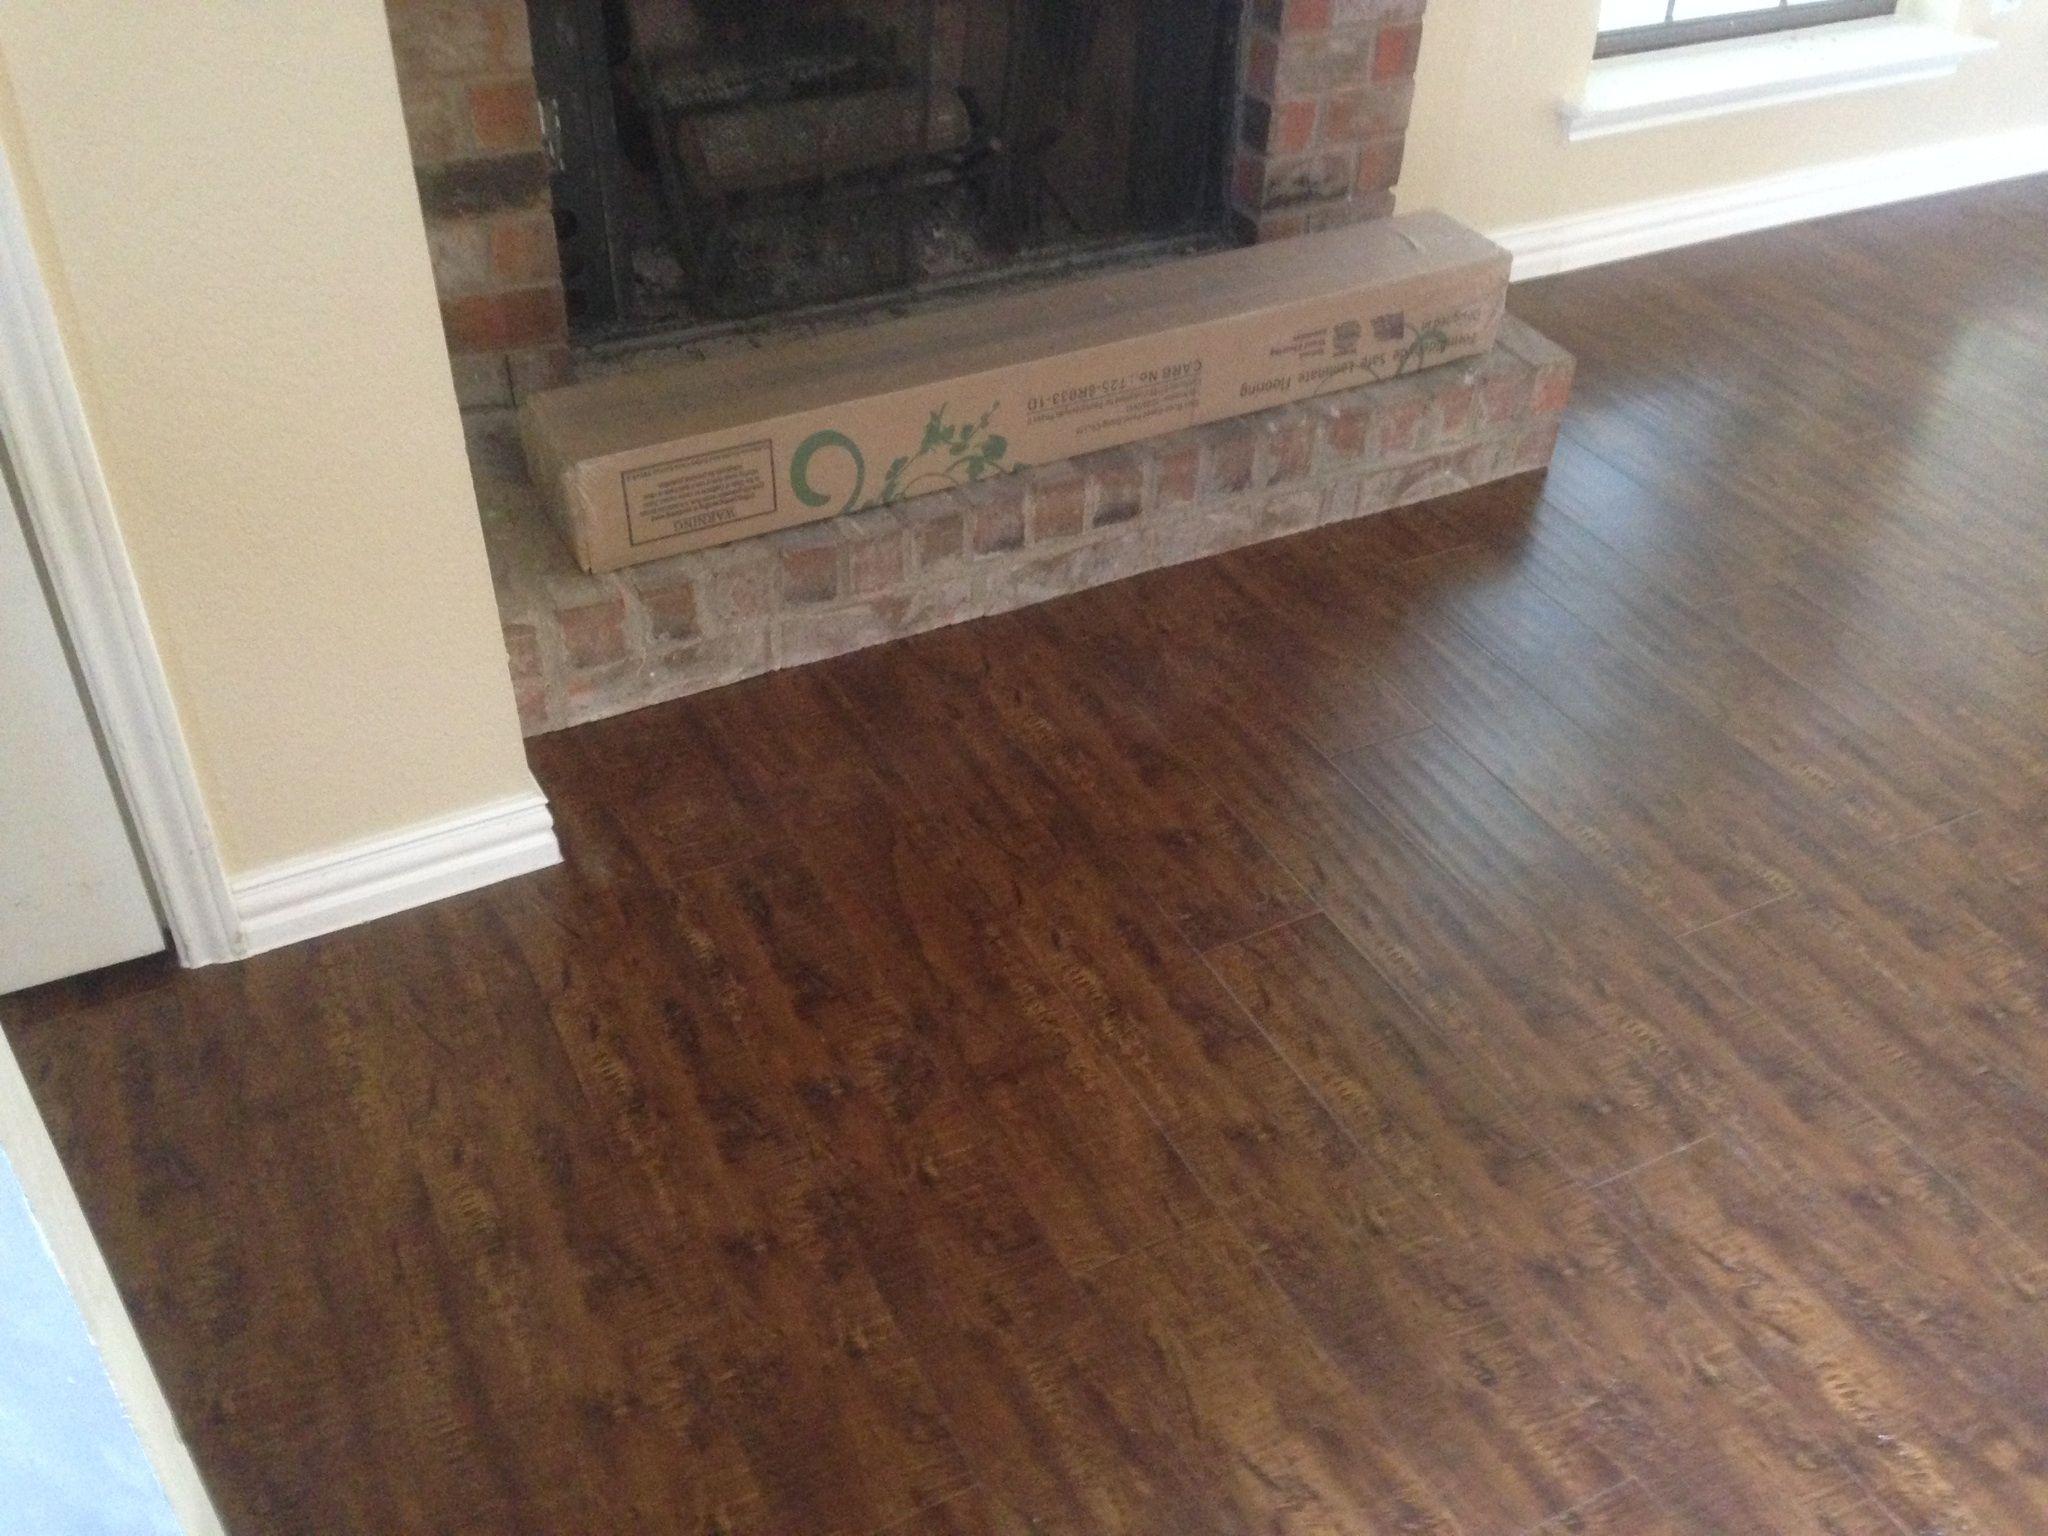 Undercut Fireplace With Laminate Floor Luxury Vinyl Plank Flooring Luxury Vinyl Plank Flooring